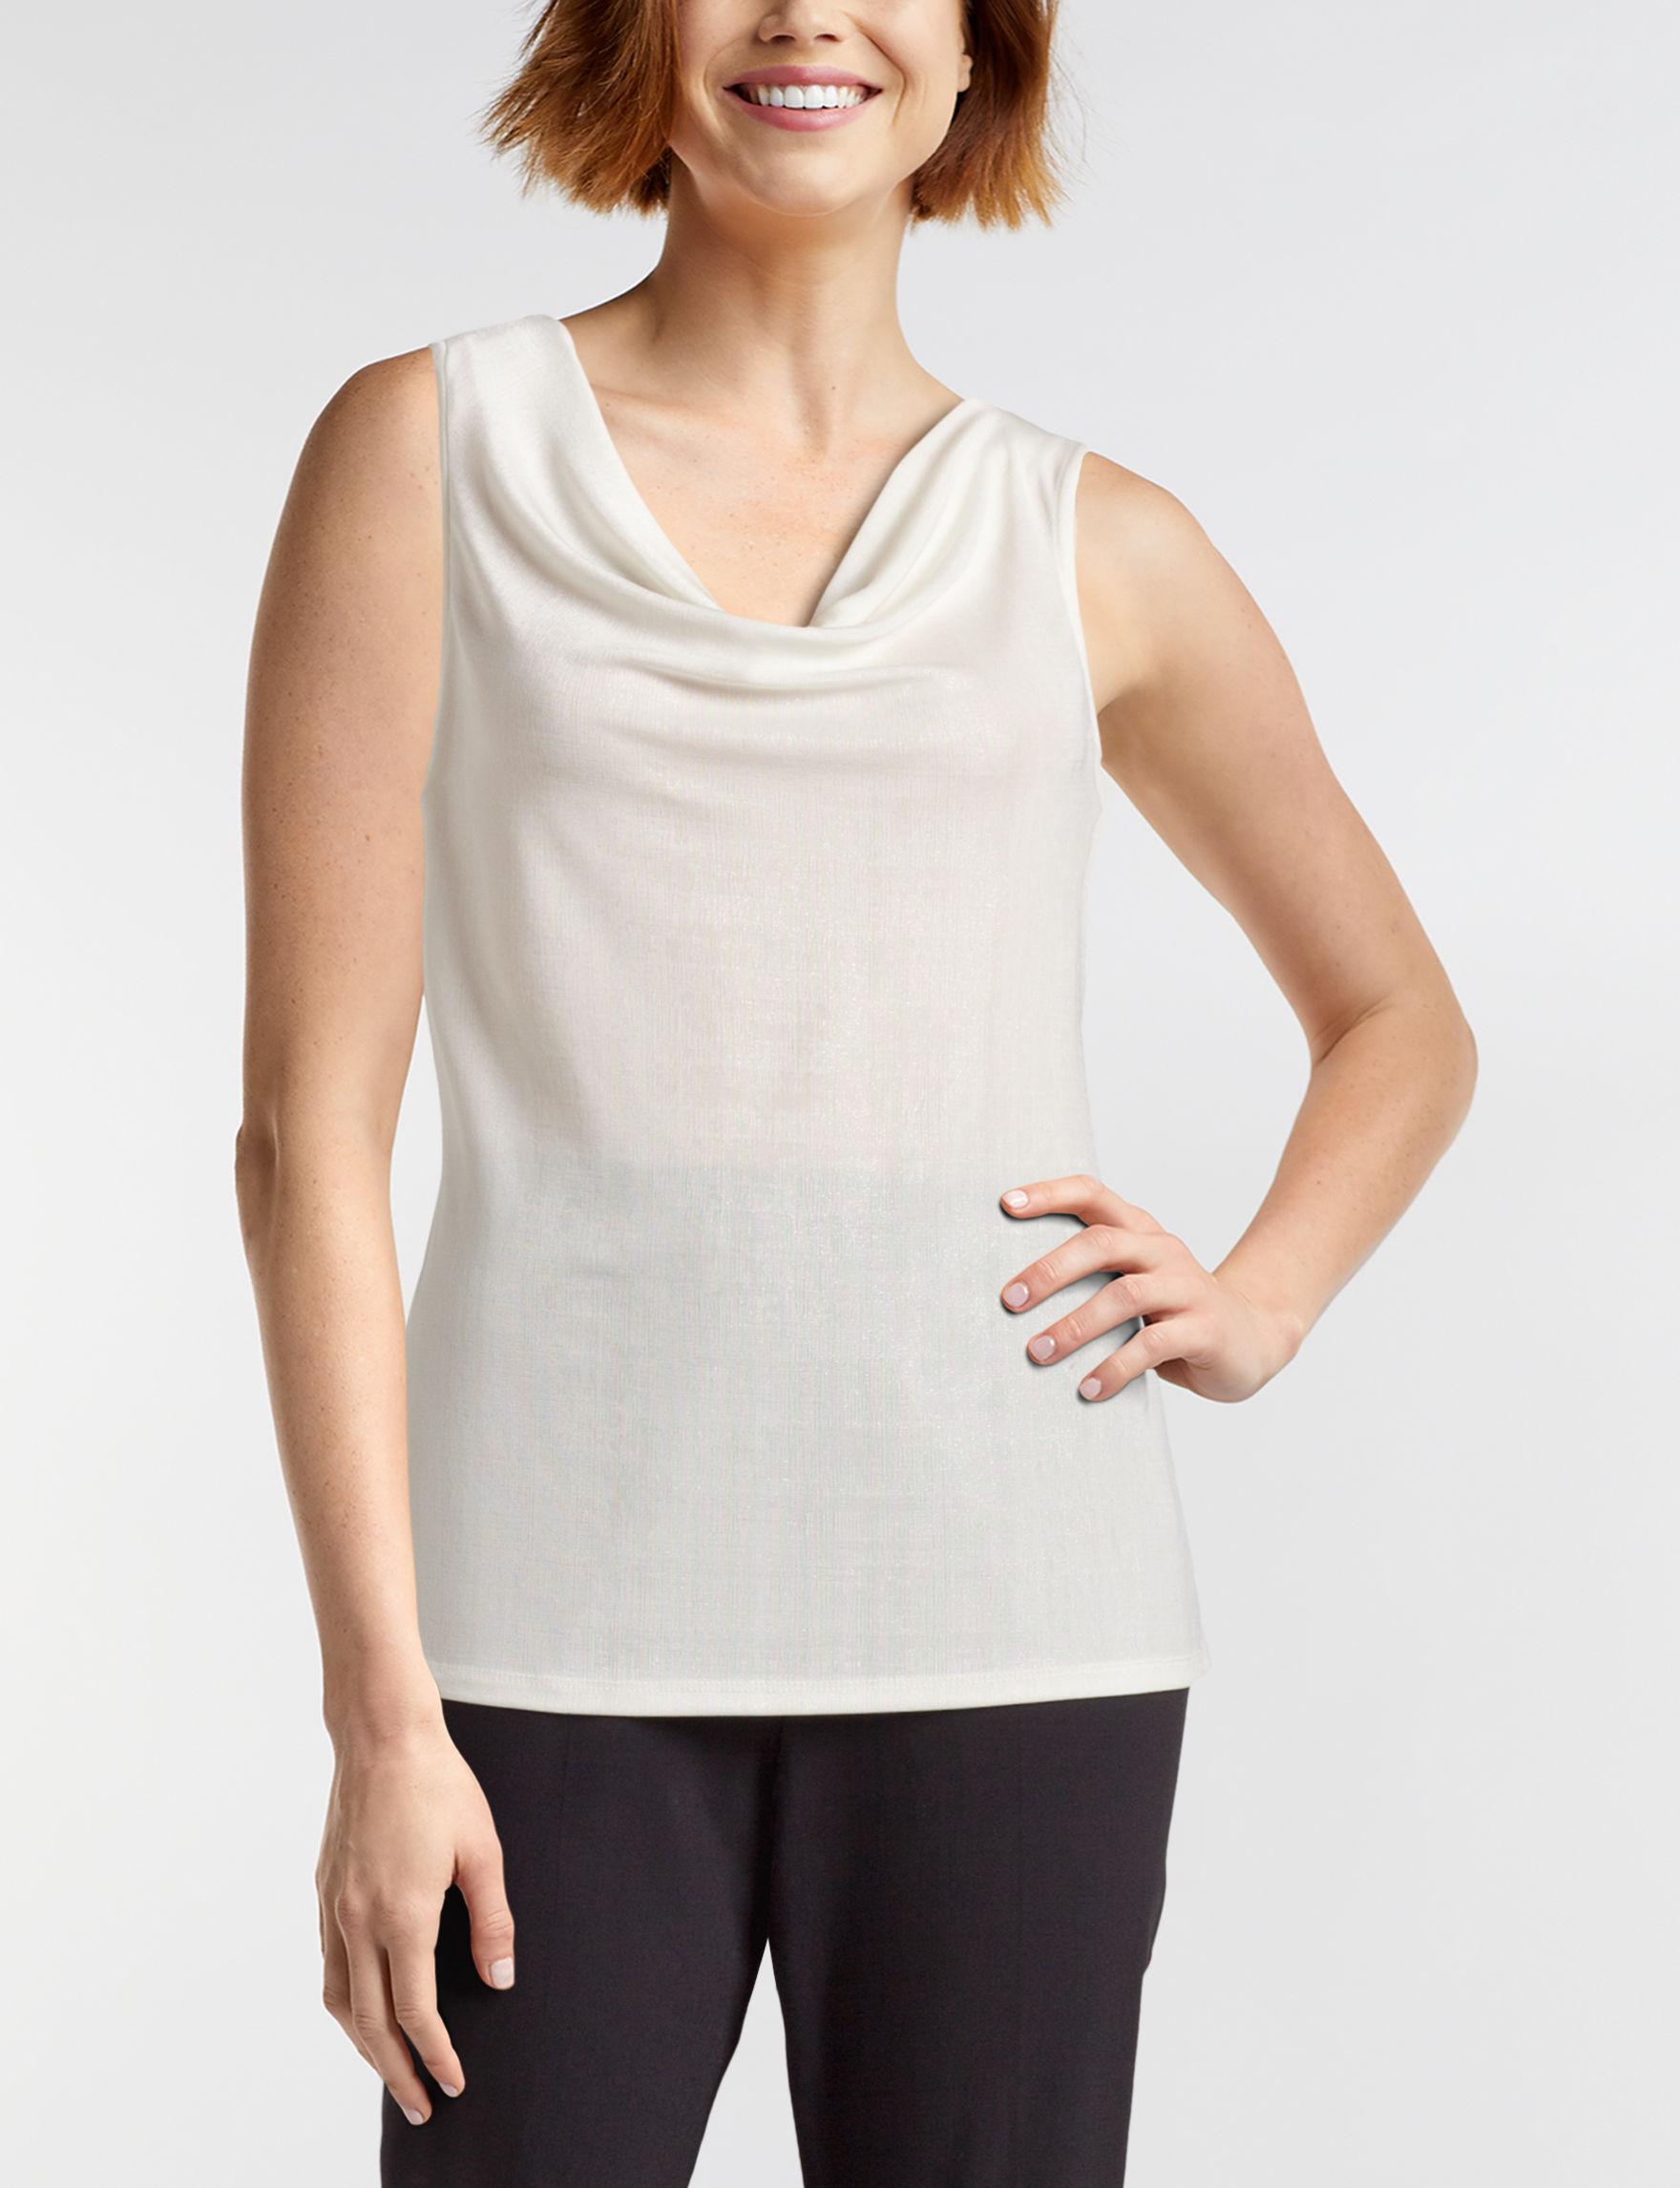 JM Studio Ivory Shirts & Blouses